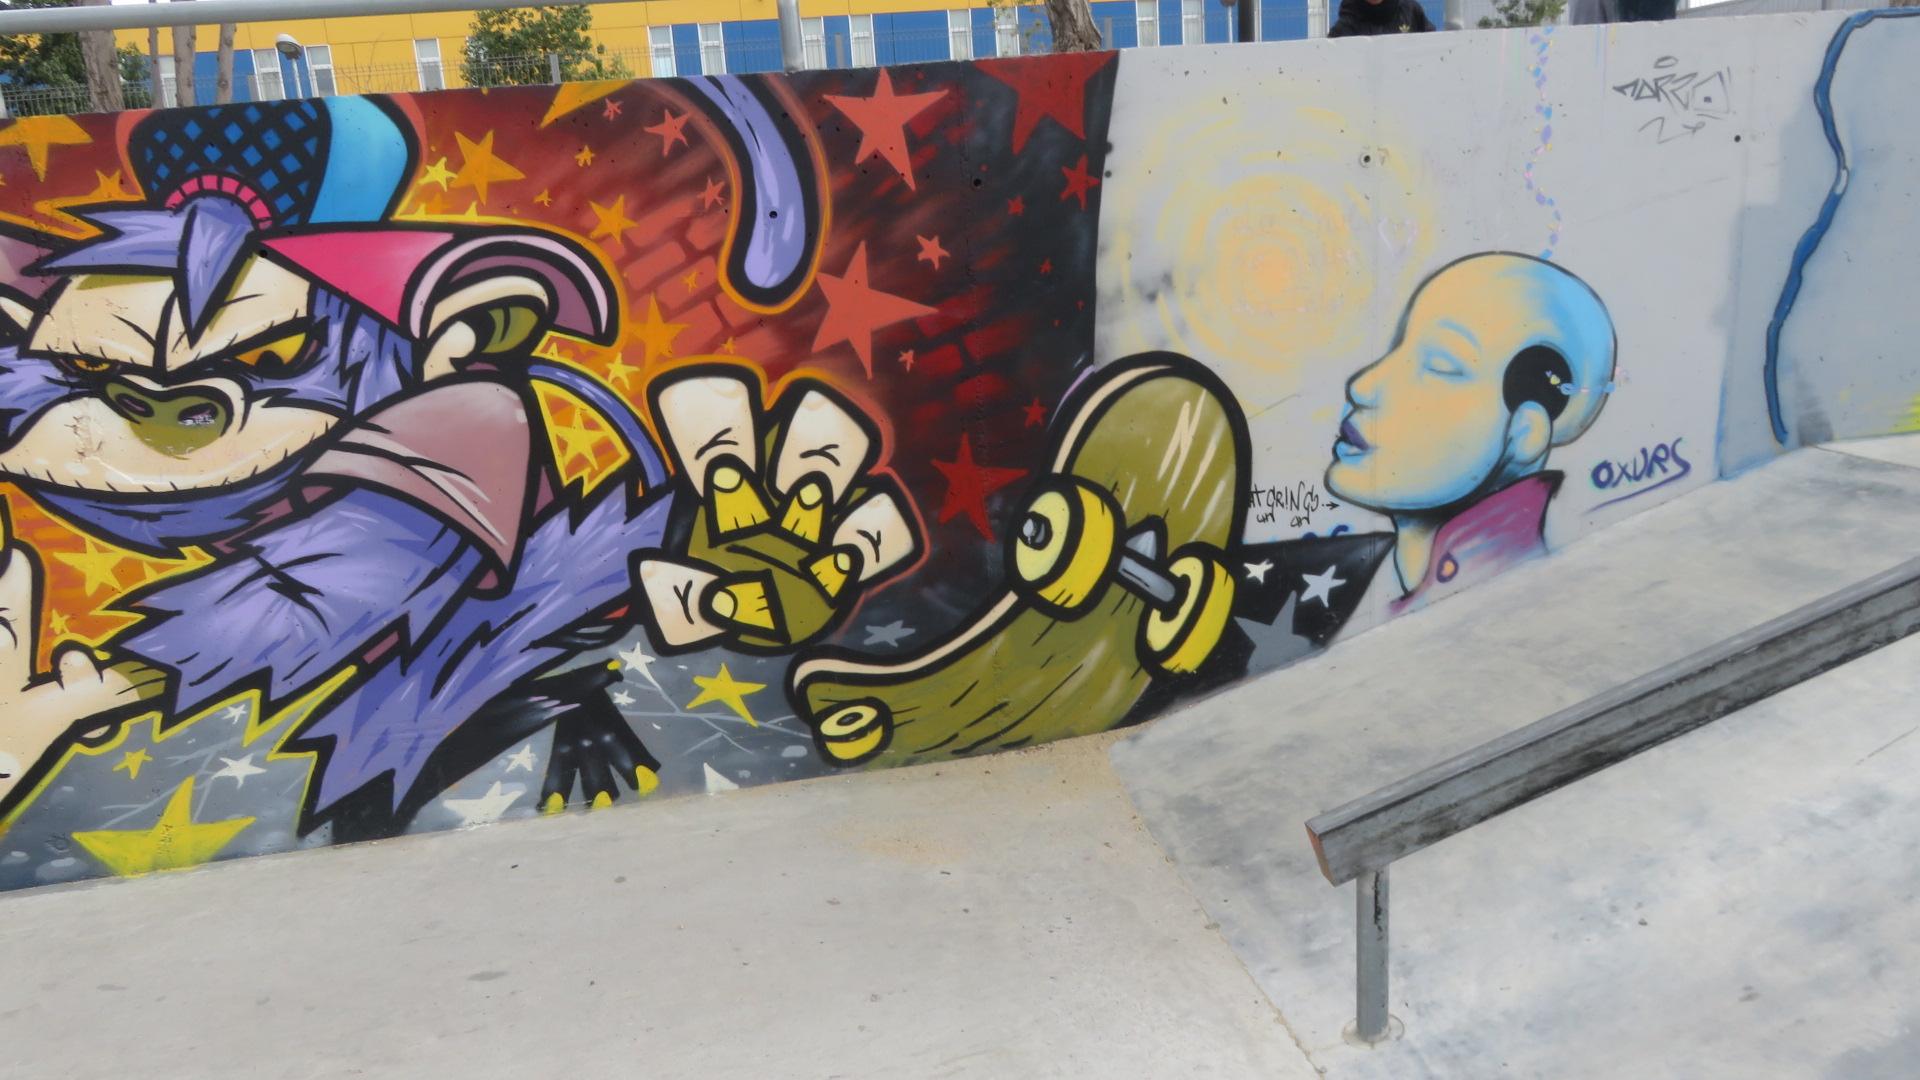 Urban art sex and skate and rocknroll skatepark de figueres graffiti altavistaventures Image collections